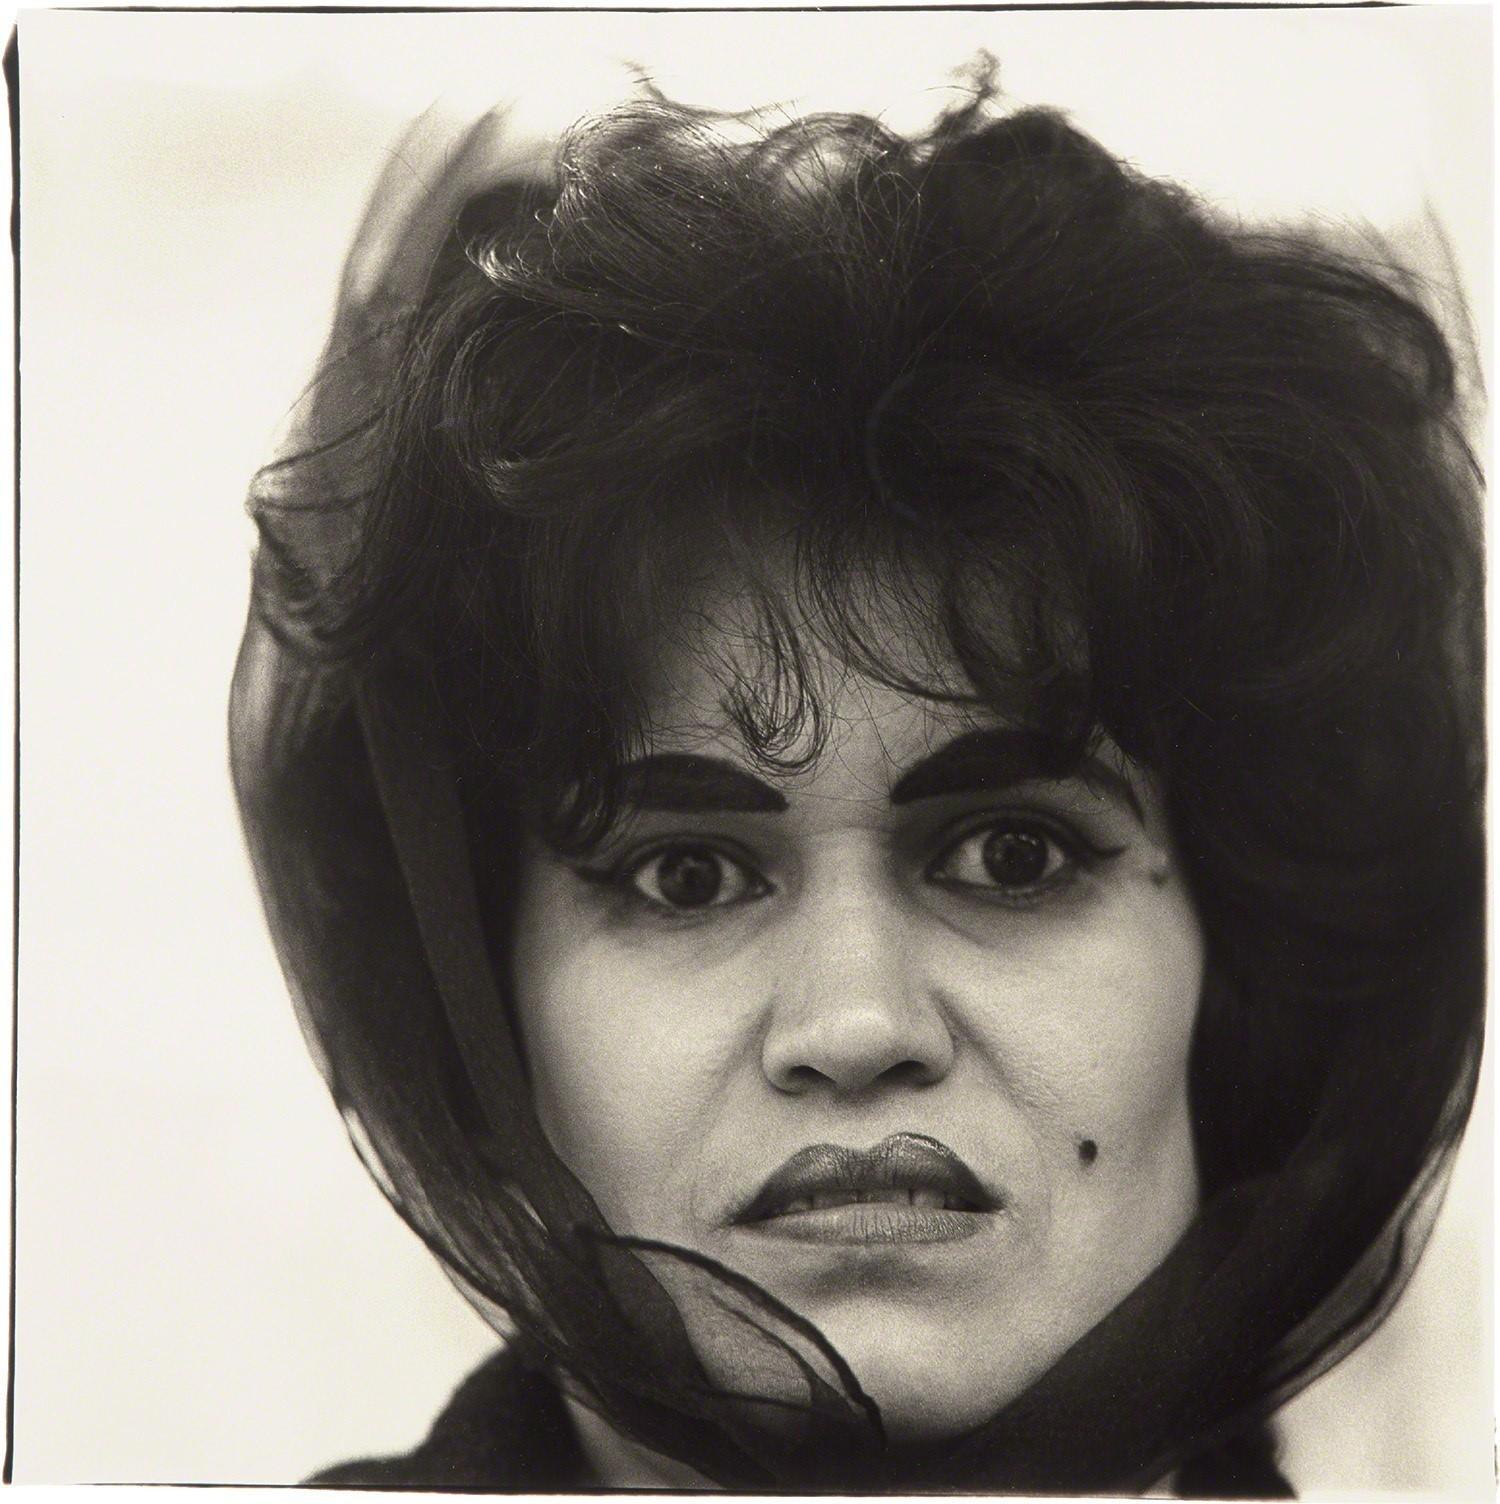 Пуэрториканка с отметкой красоты, Нью-Йорк, 1965. Фотограф Диана Арбус